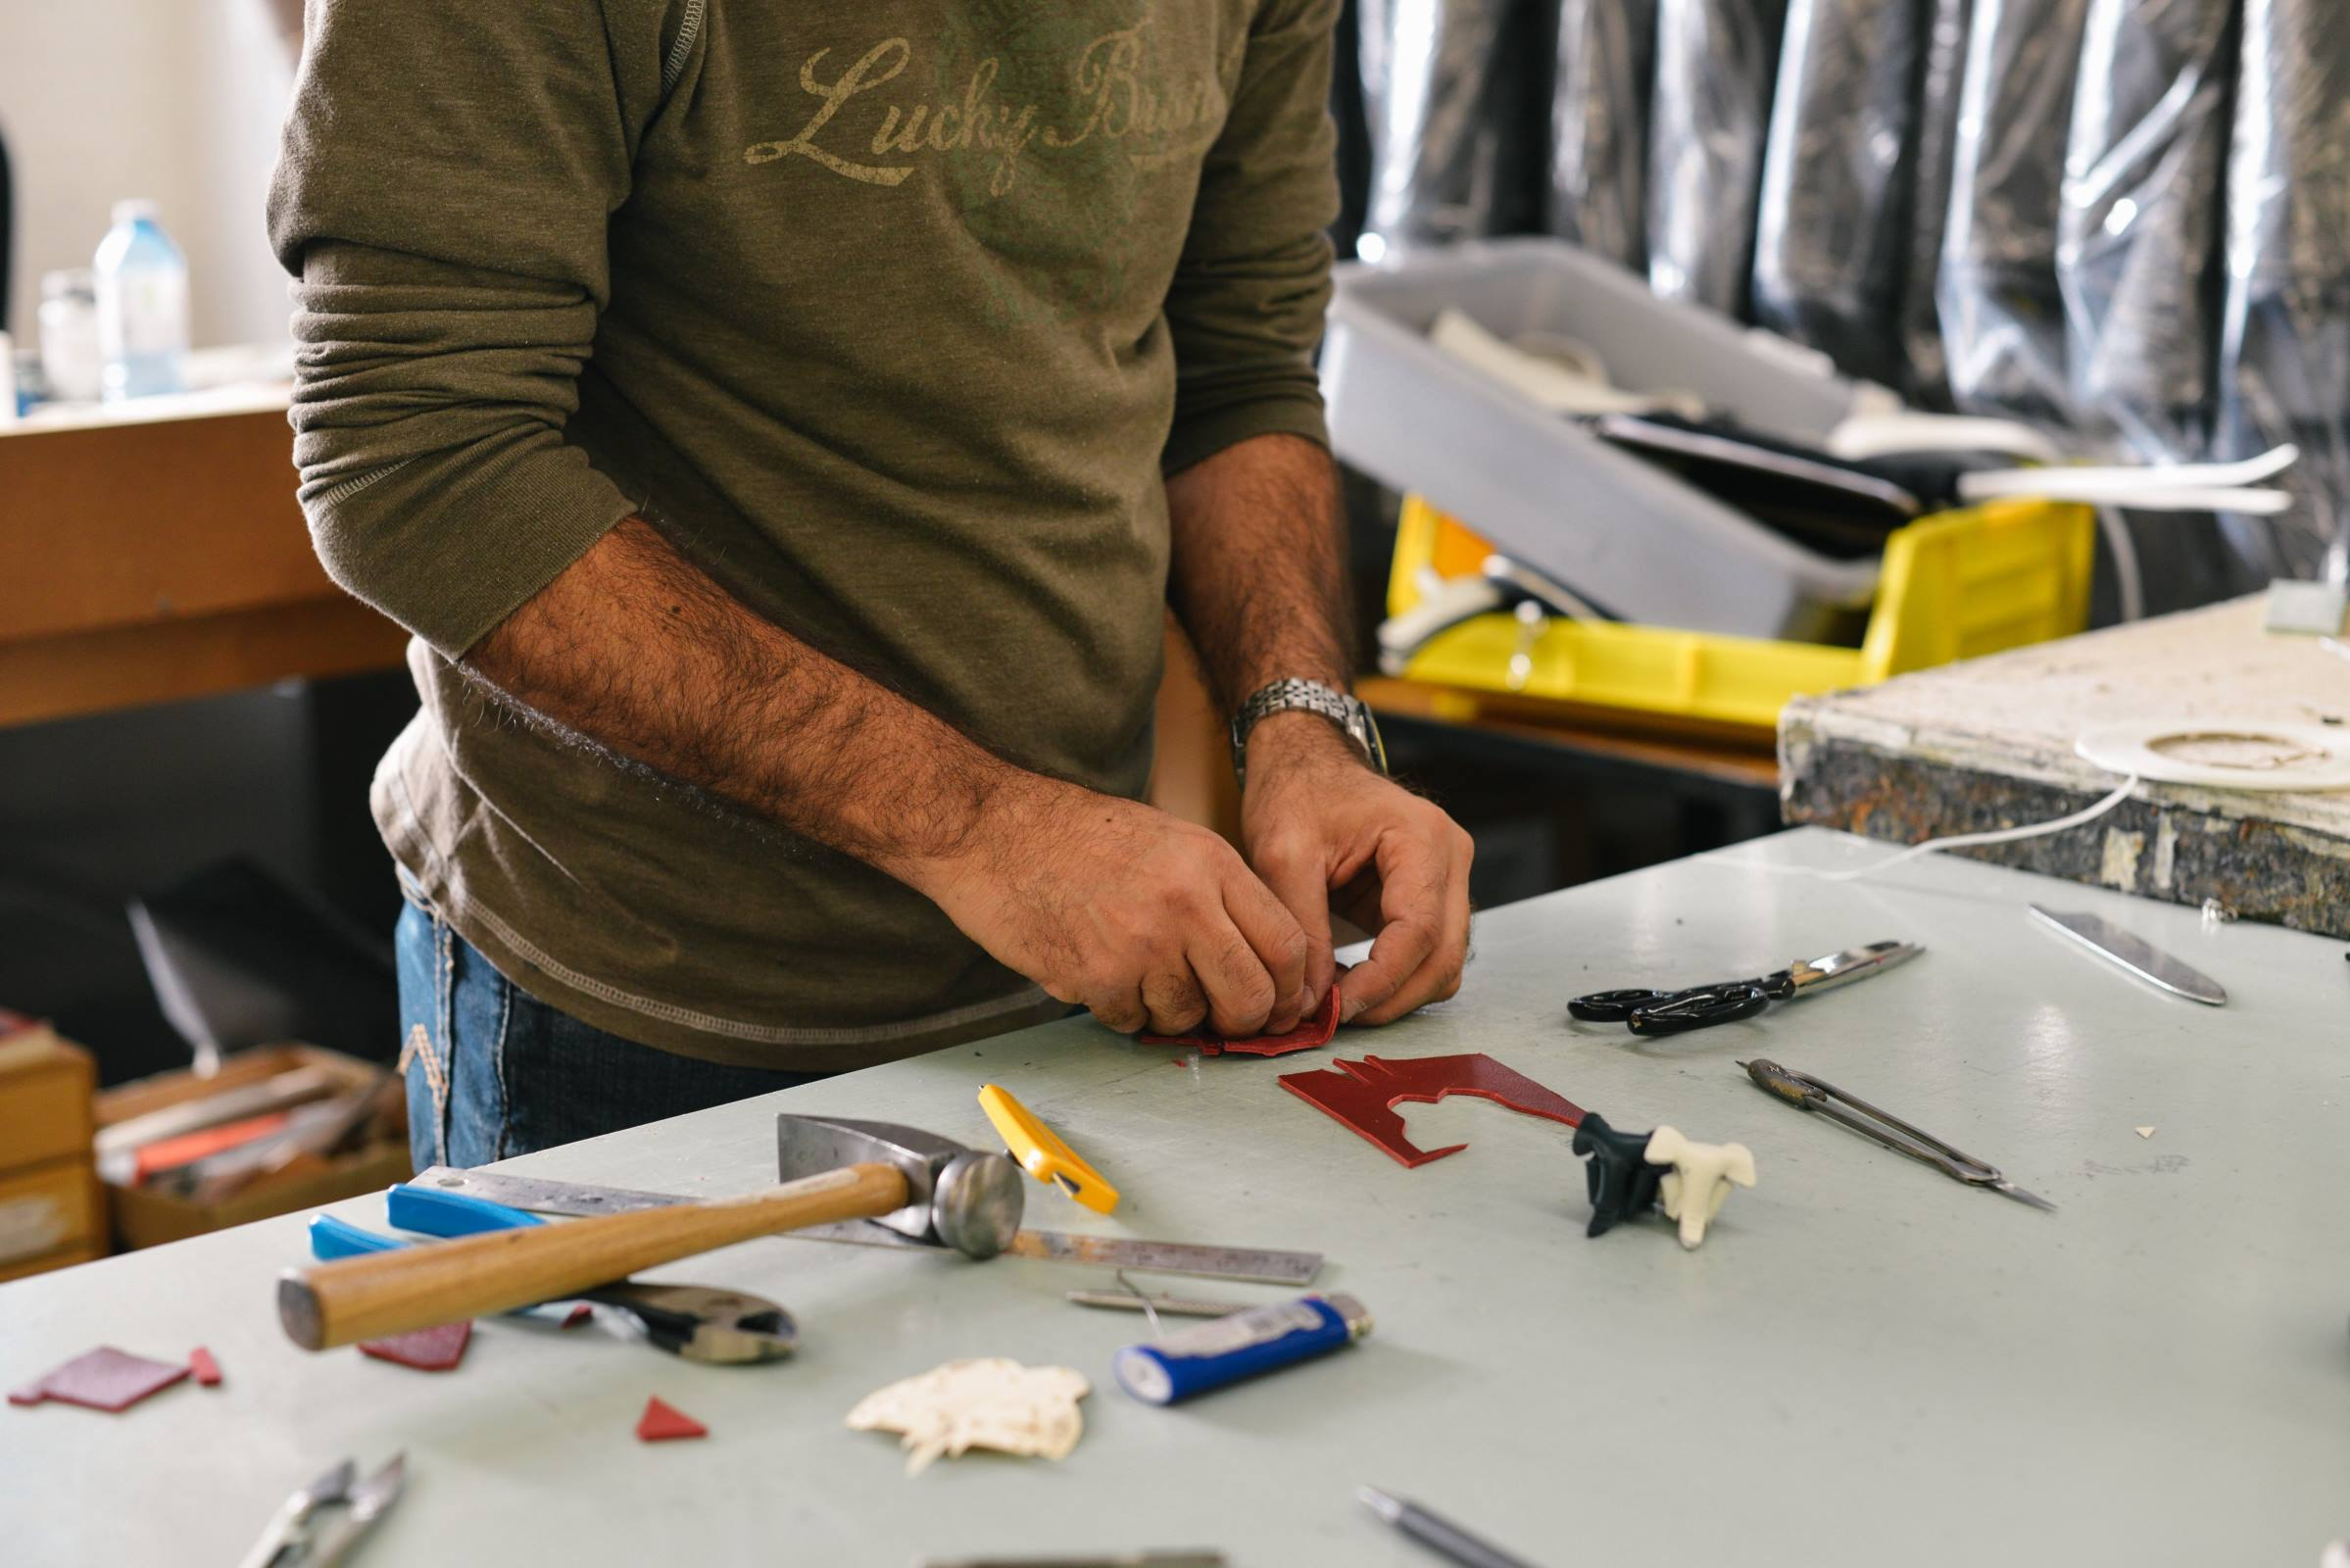 Worker tools workshop garage